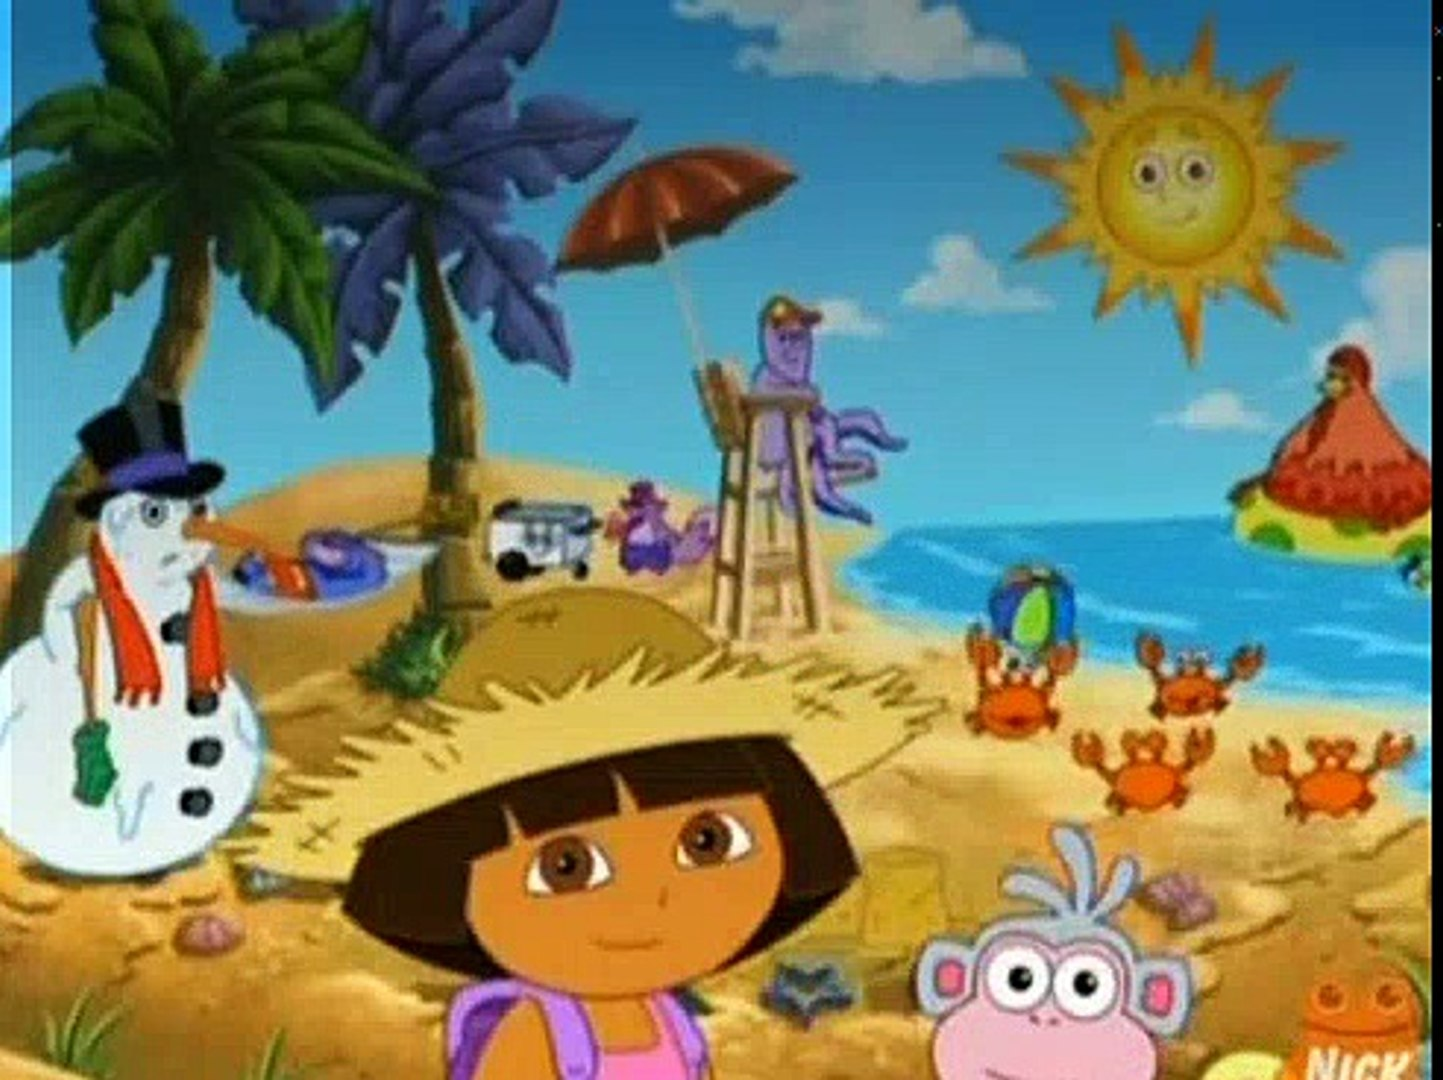 Dora the Explorer -418 - The Mixed-Up Seasons